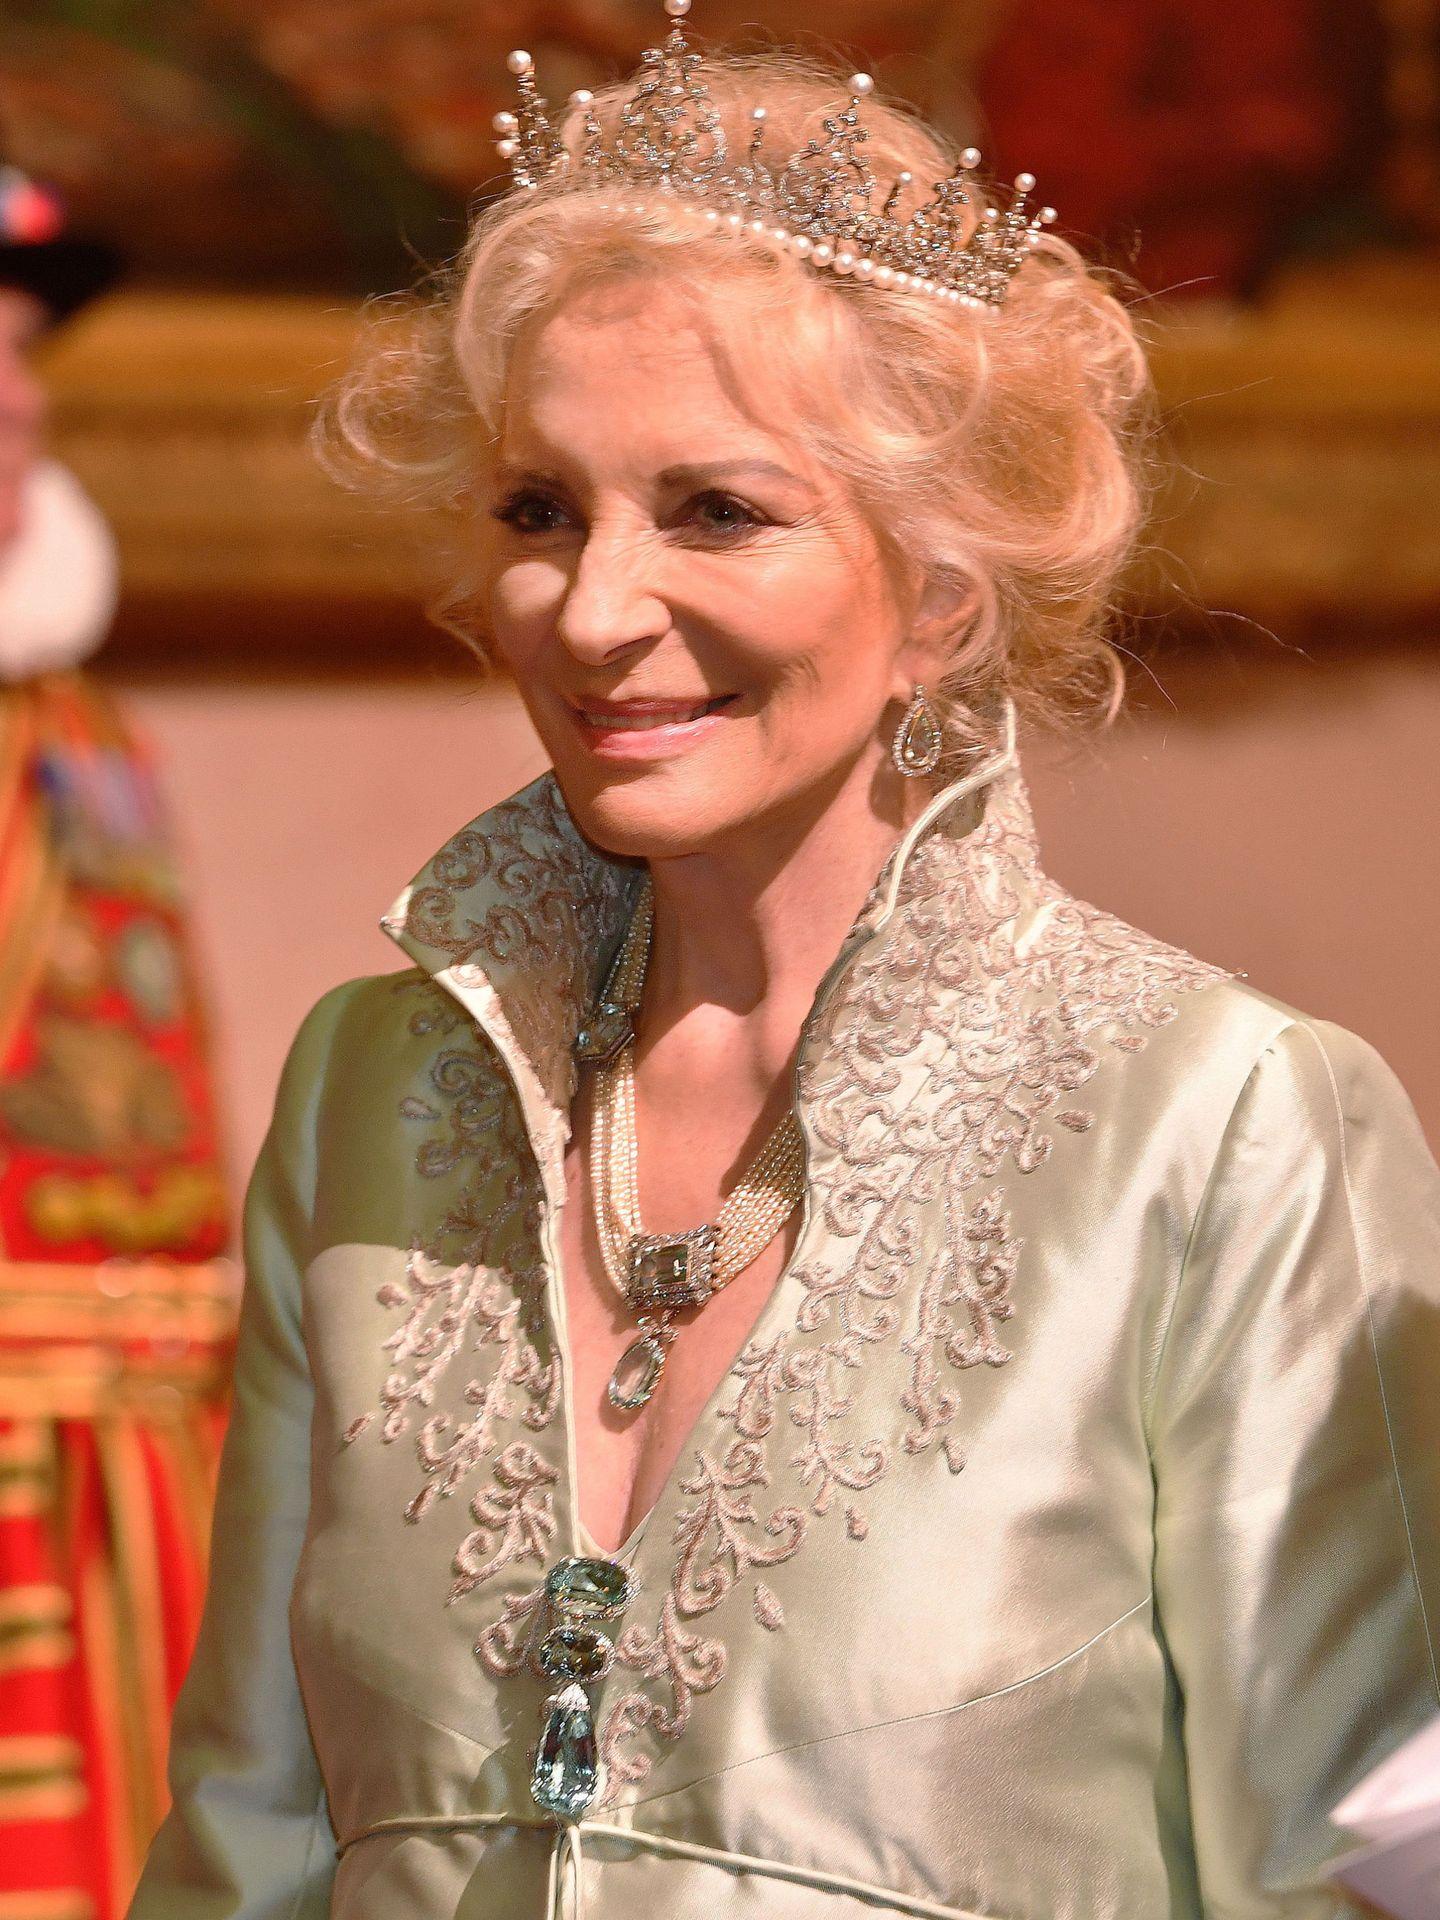 La princesa Michael de Kent en una imagen de archivo. (Reuters)